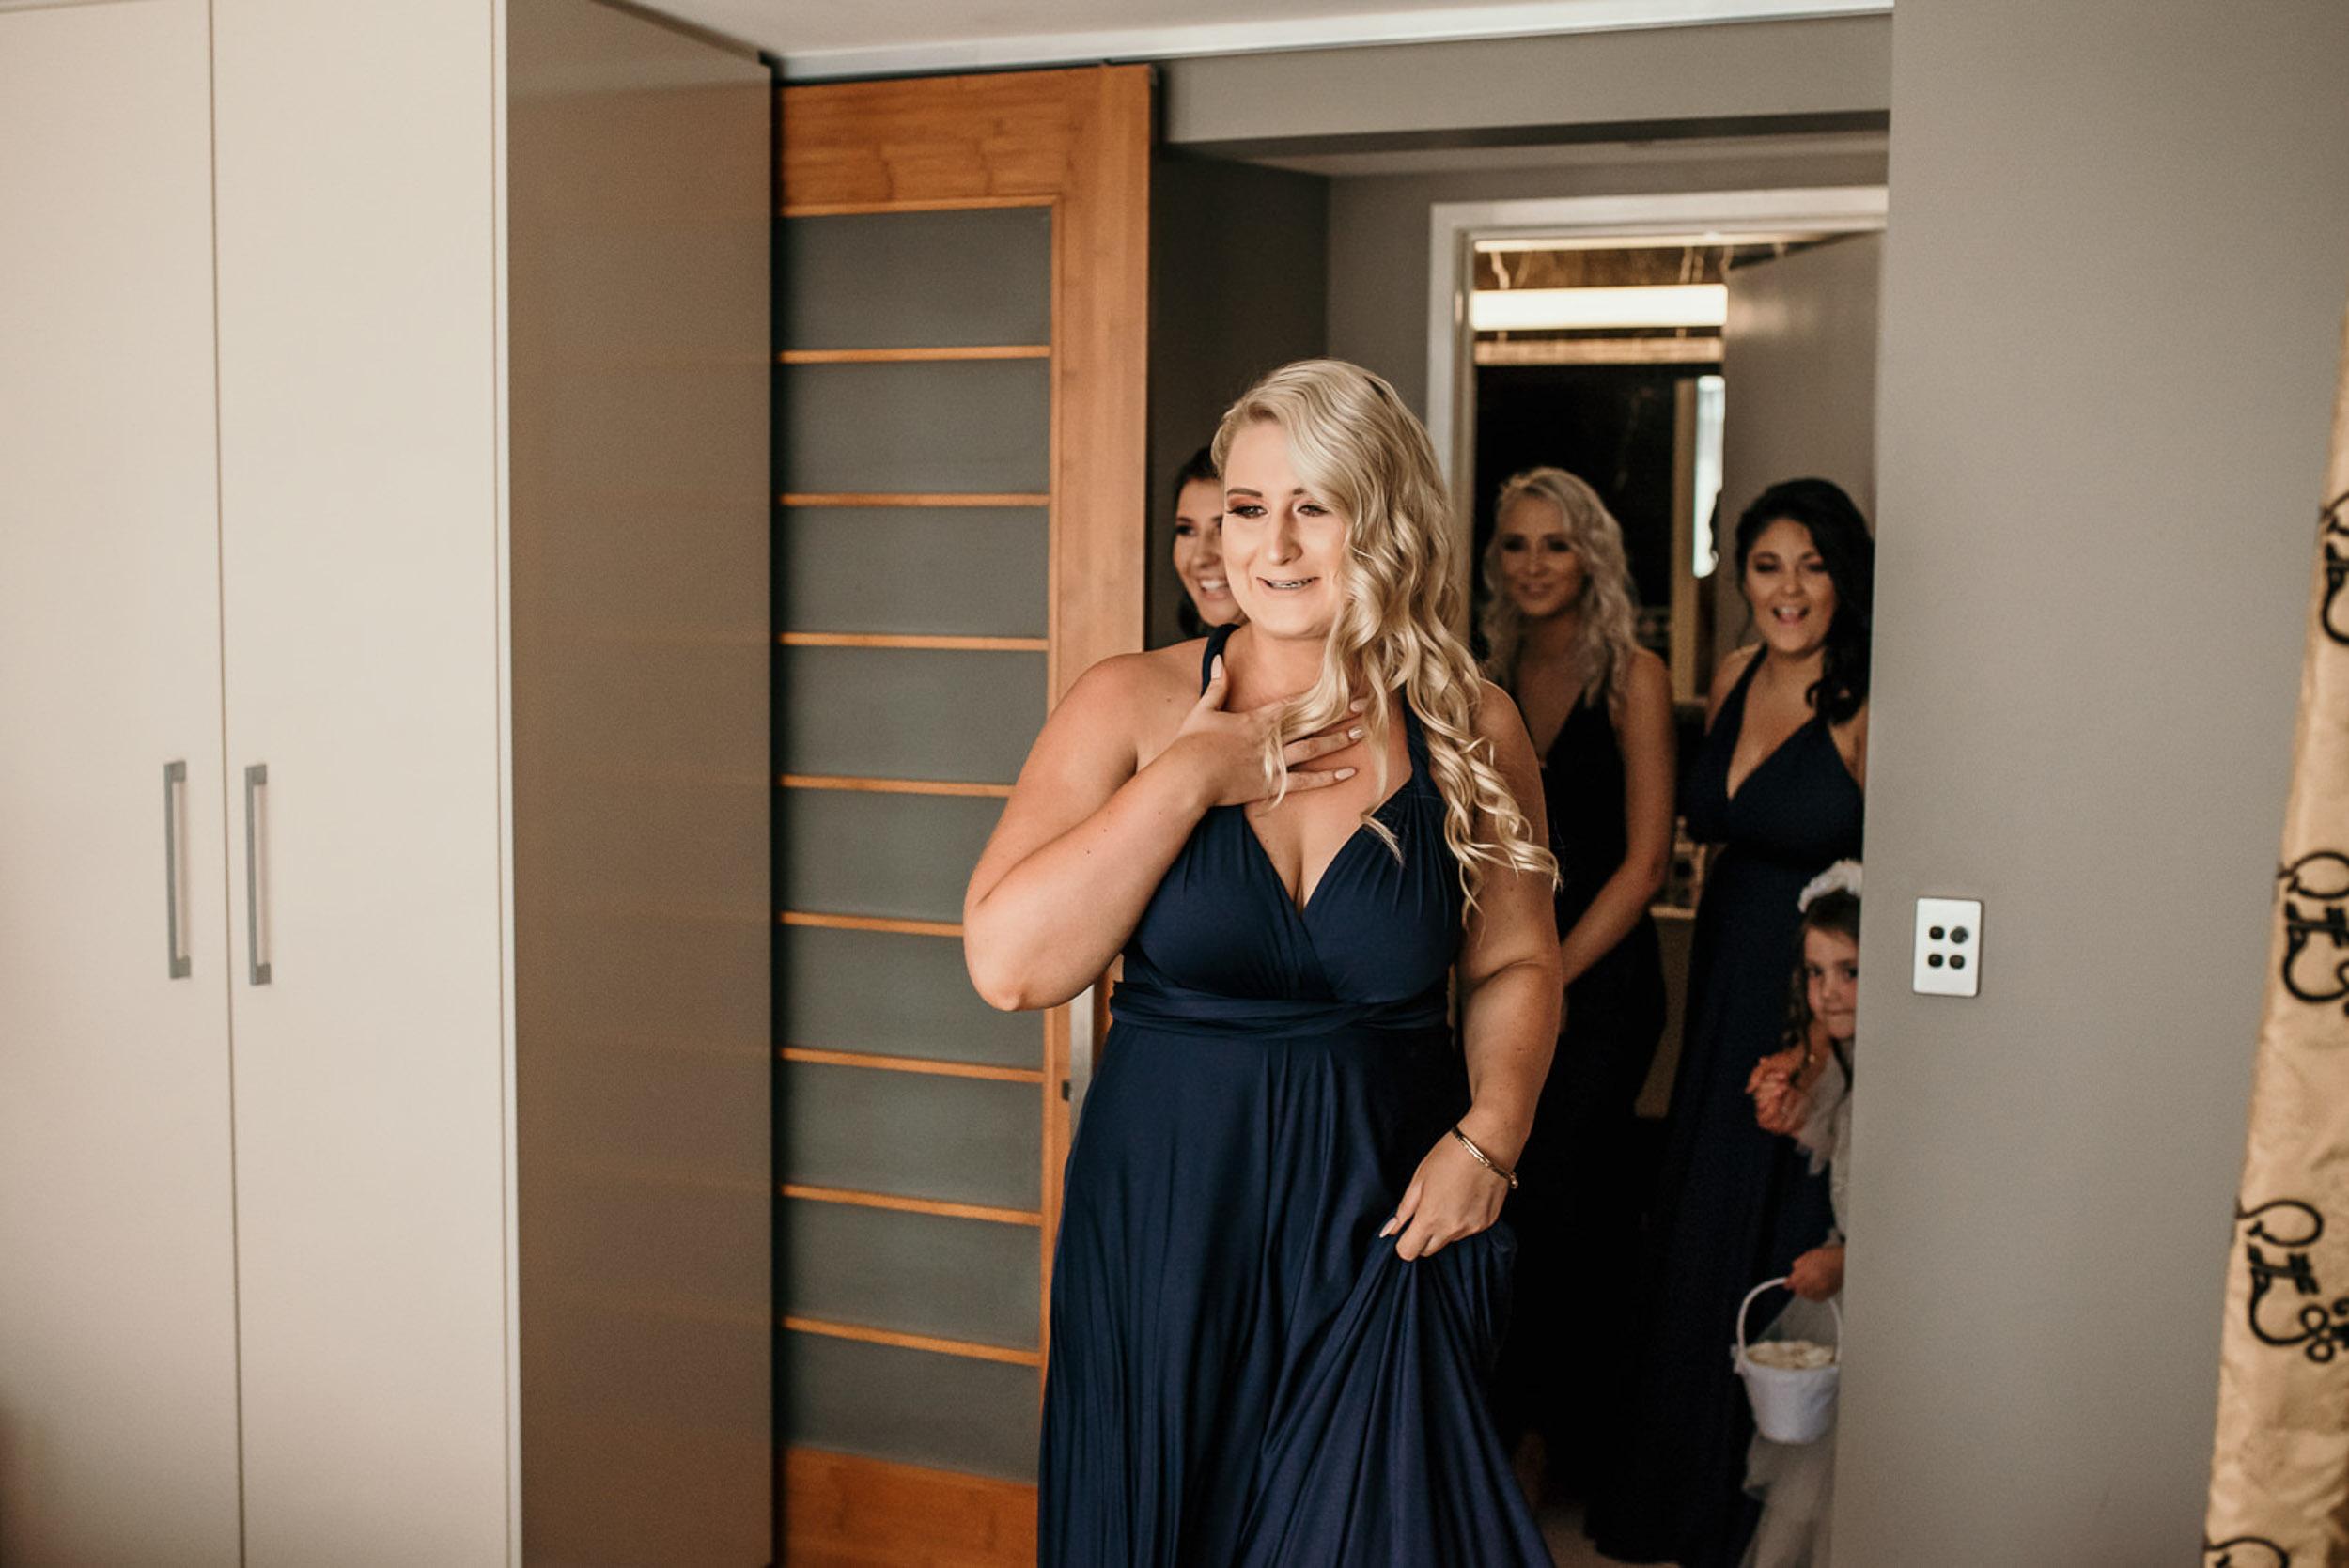 The Raw Photographer - Cairns Wedding Photographer - Fitzroy Island - Destination Wedding - Bride Dress - Groom Portrait - Queensland-13.jpg